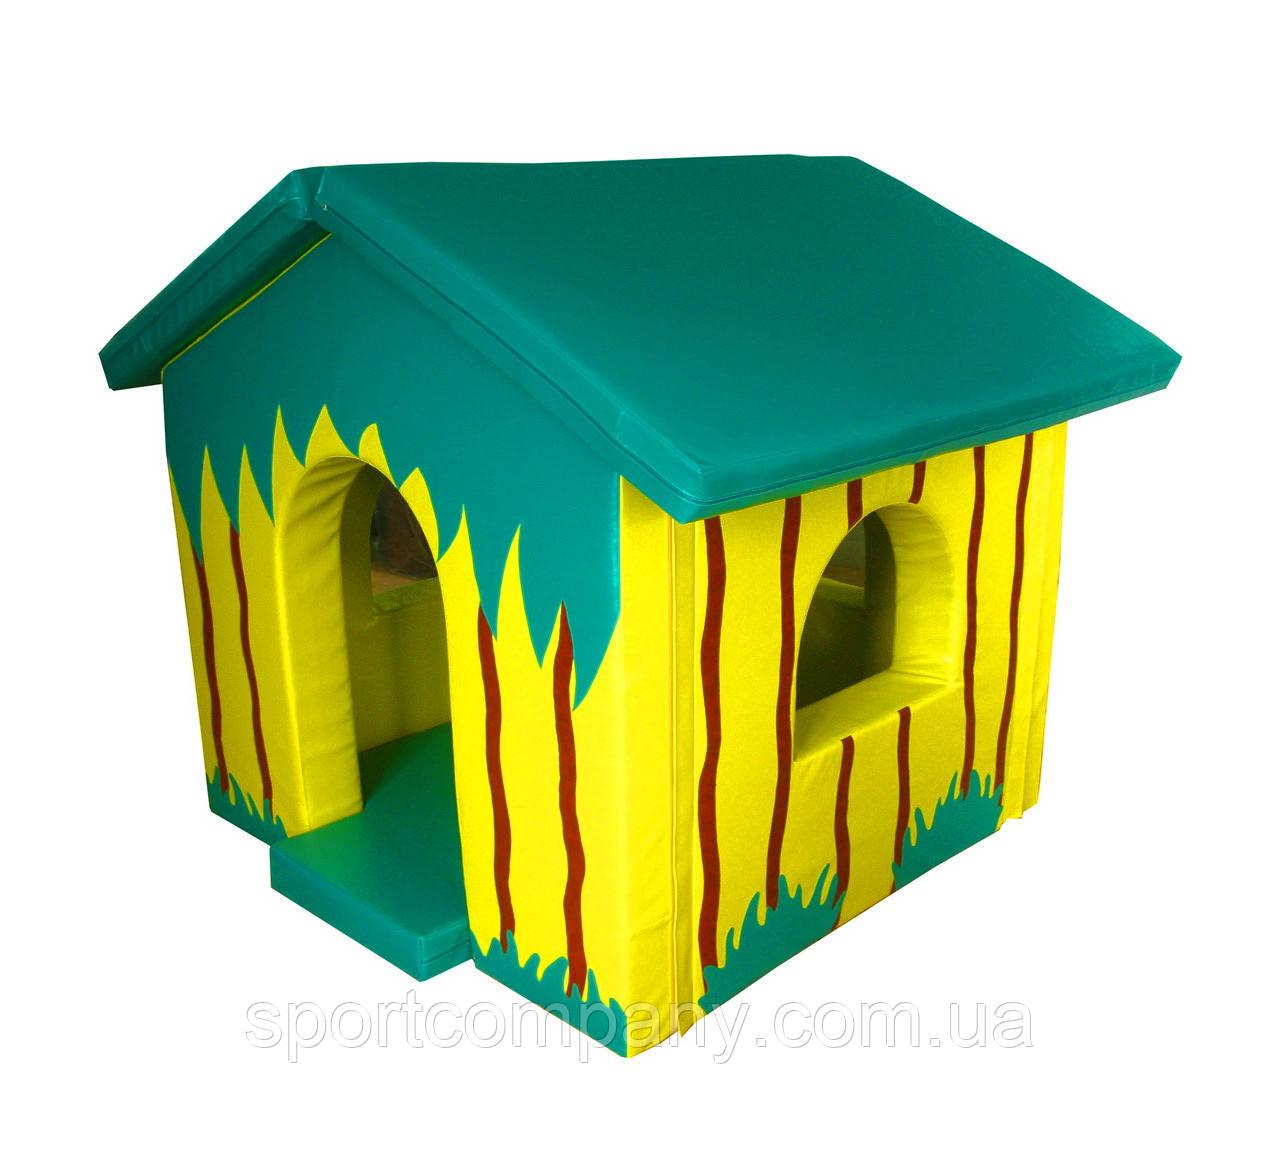 Мягкий домик Джунгли большой